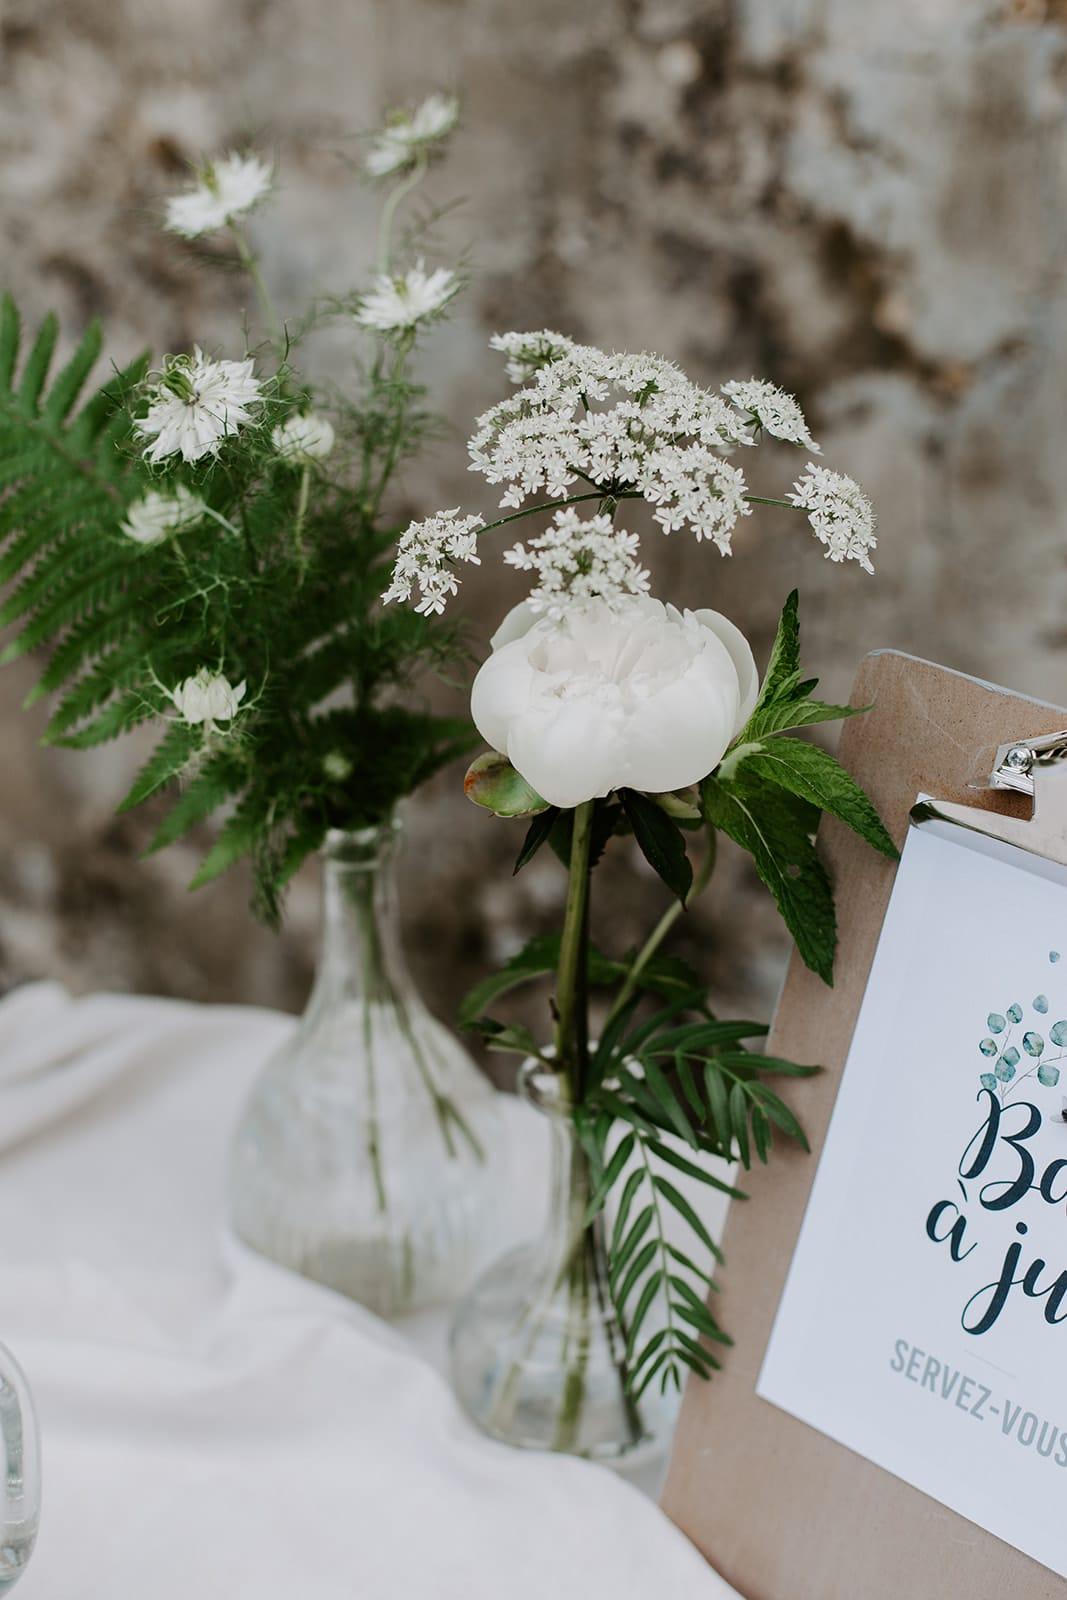 mariage_chateau_la_flocelliere_vendee_flavie_nelly_photographe-102-obonheurdesdames-decoration-mariage-location-vegetal